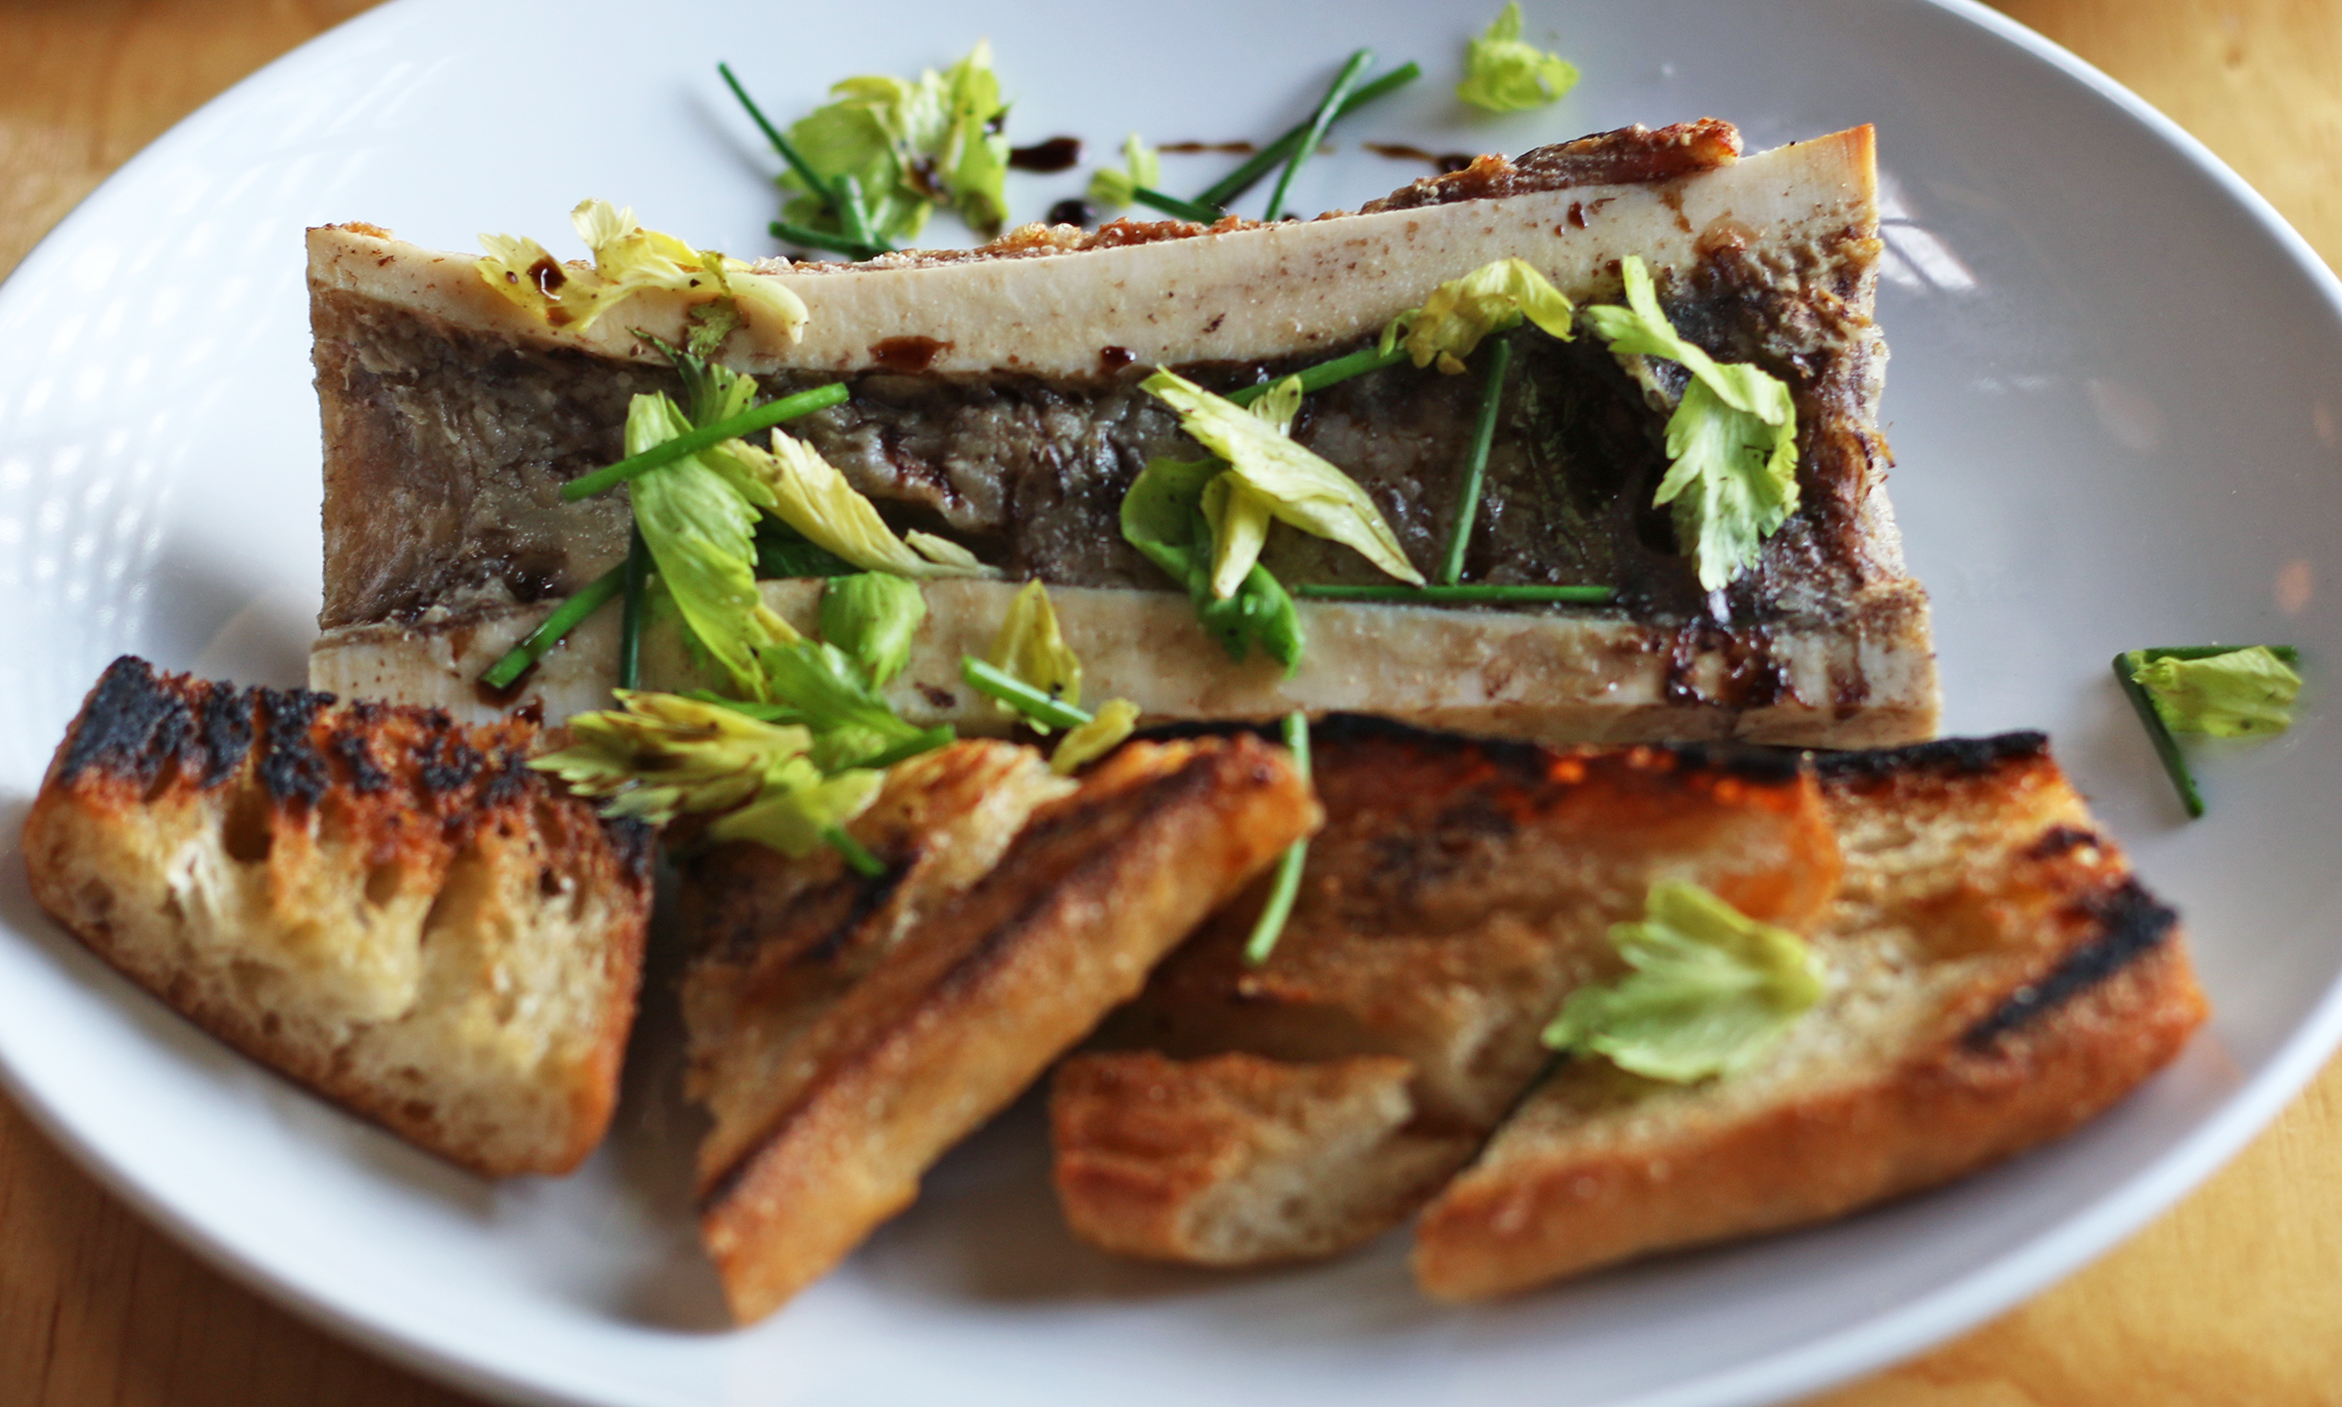 Bone Marrow and Toasted Bread